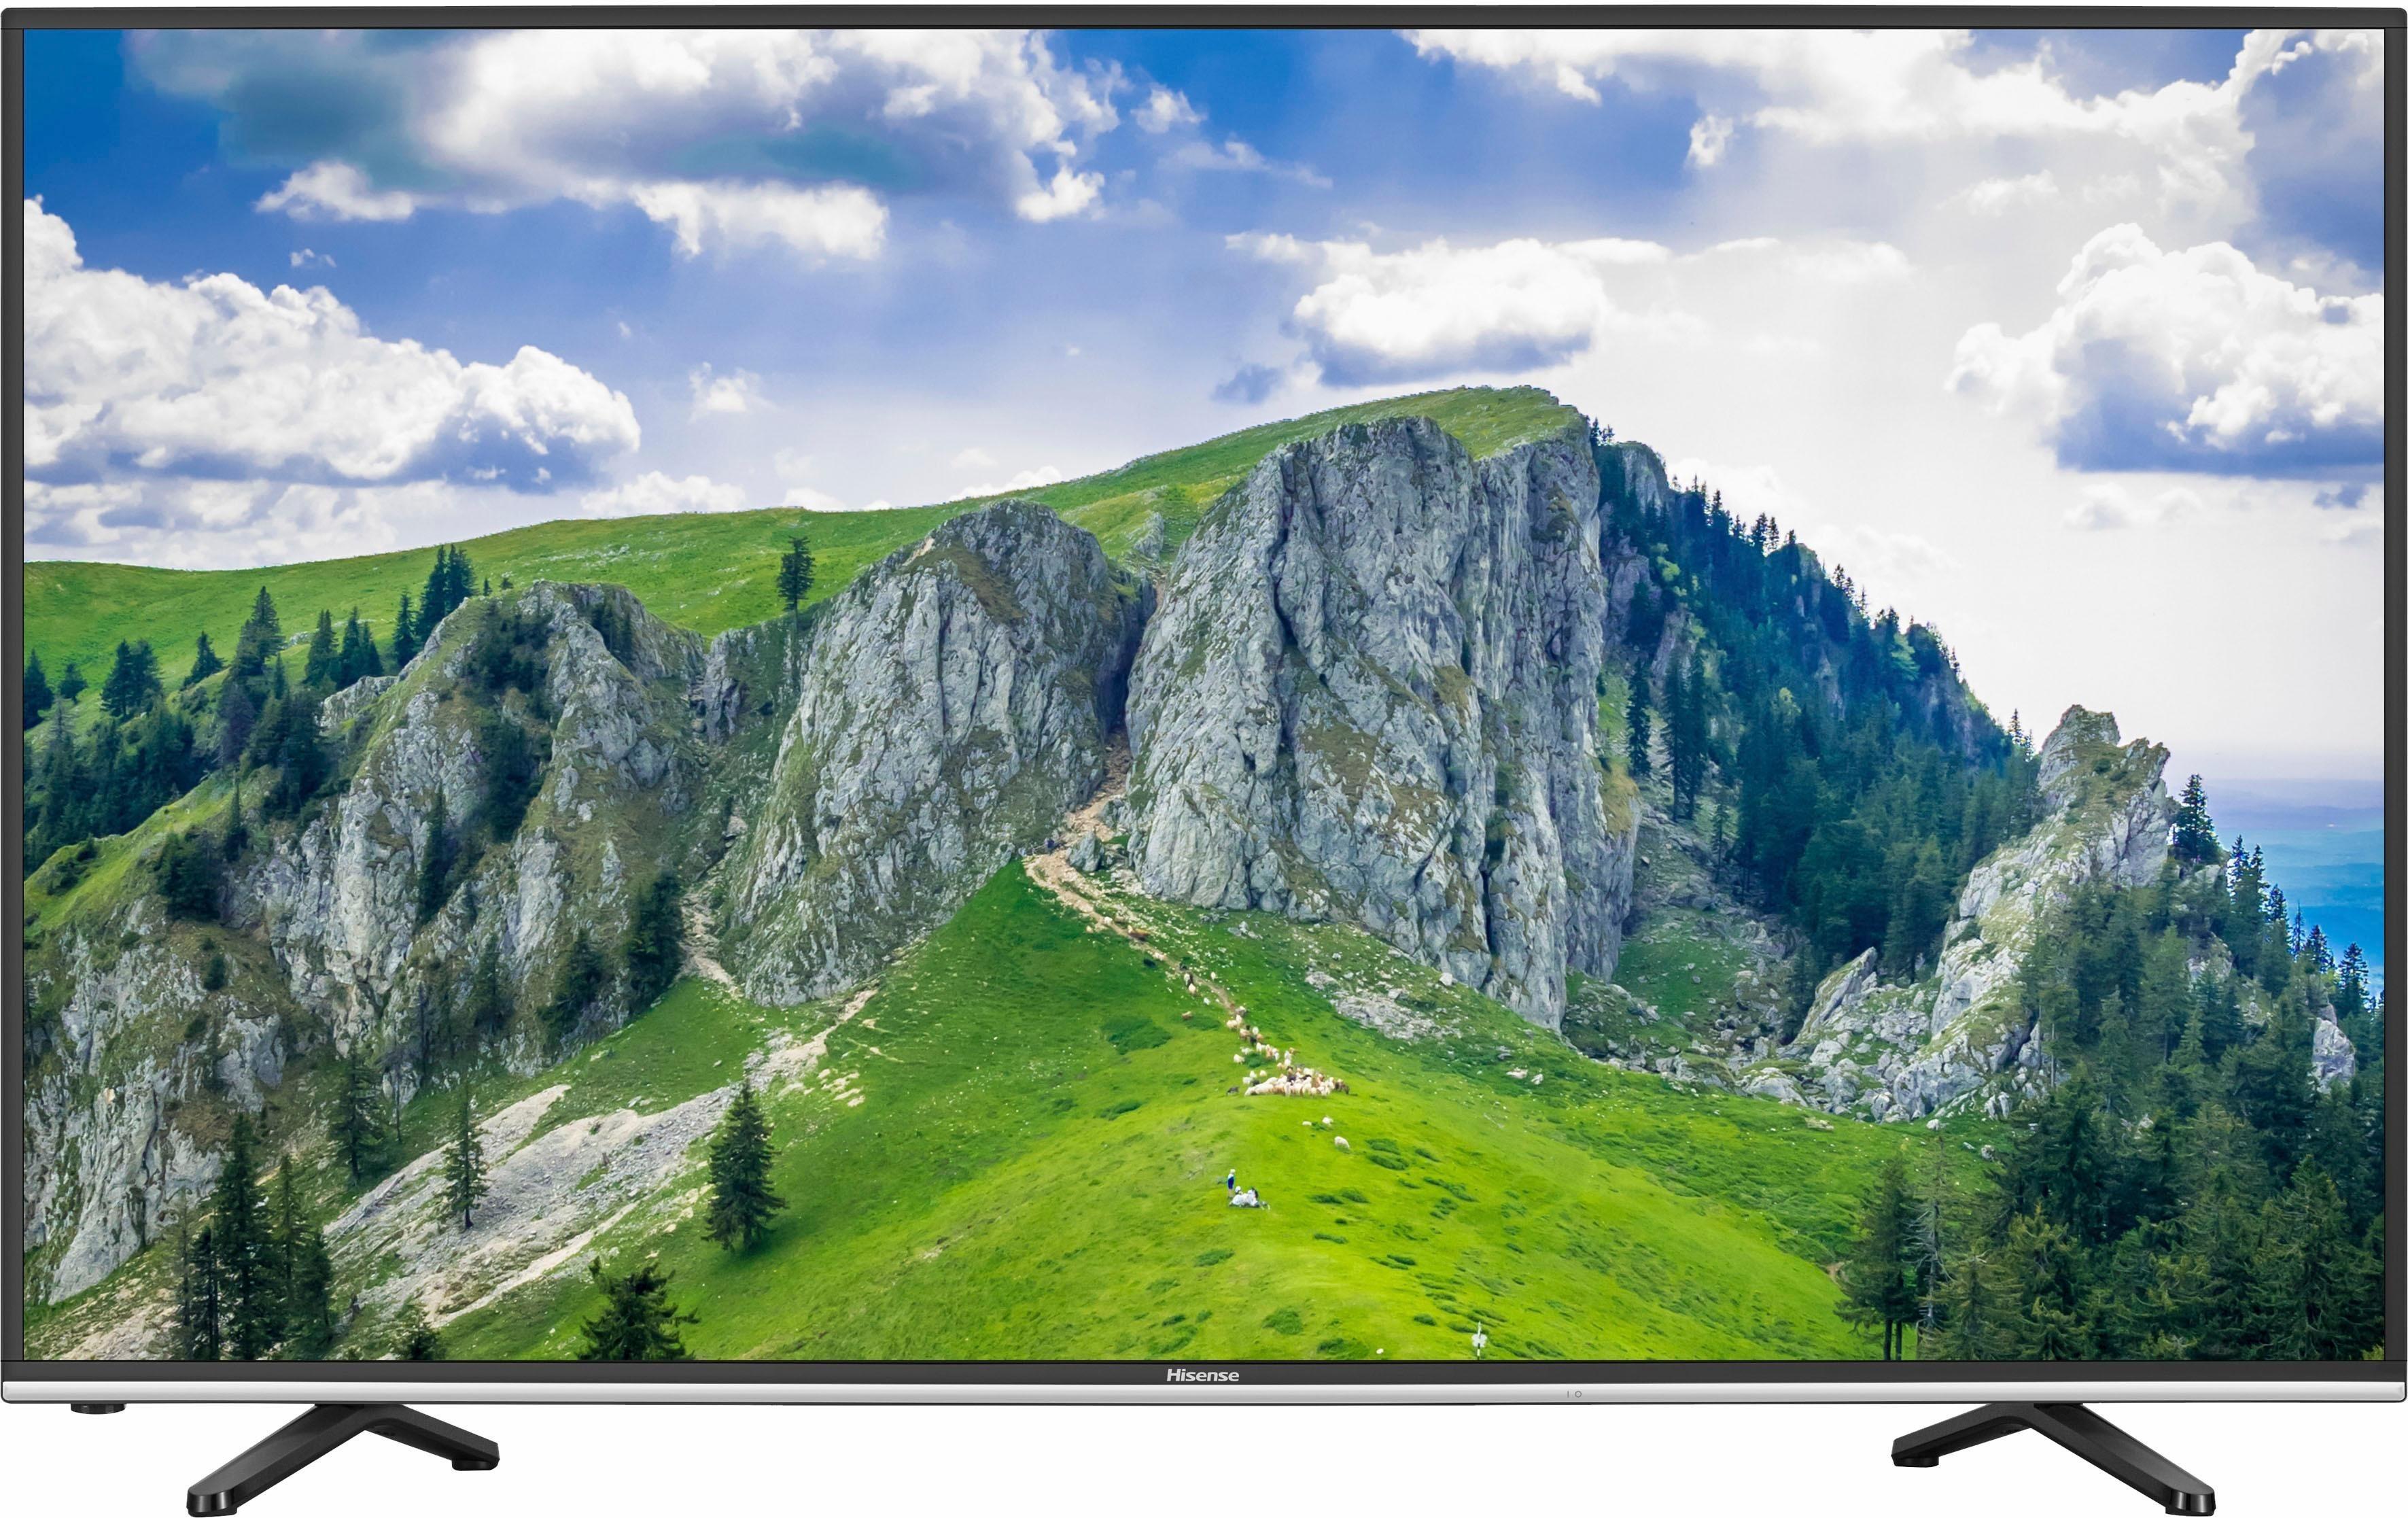 #Hisense H55MEC3050, 138 cm (55 Zoll), 2160p (4K Ultra HD)#